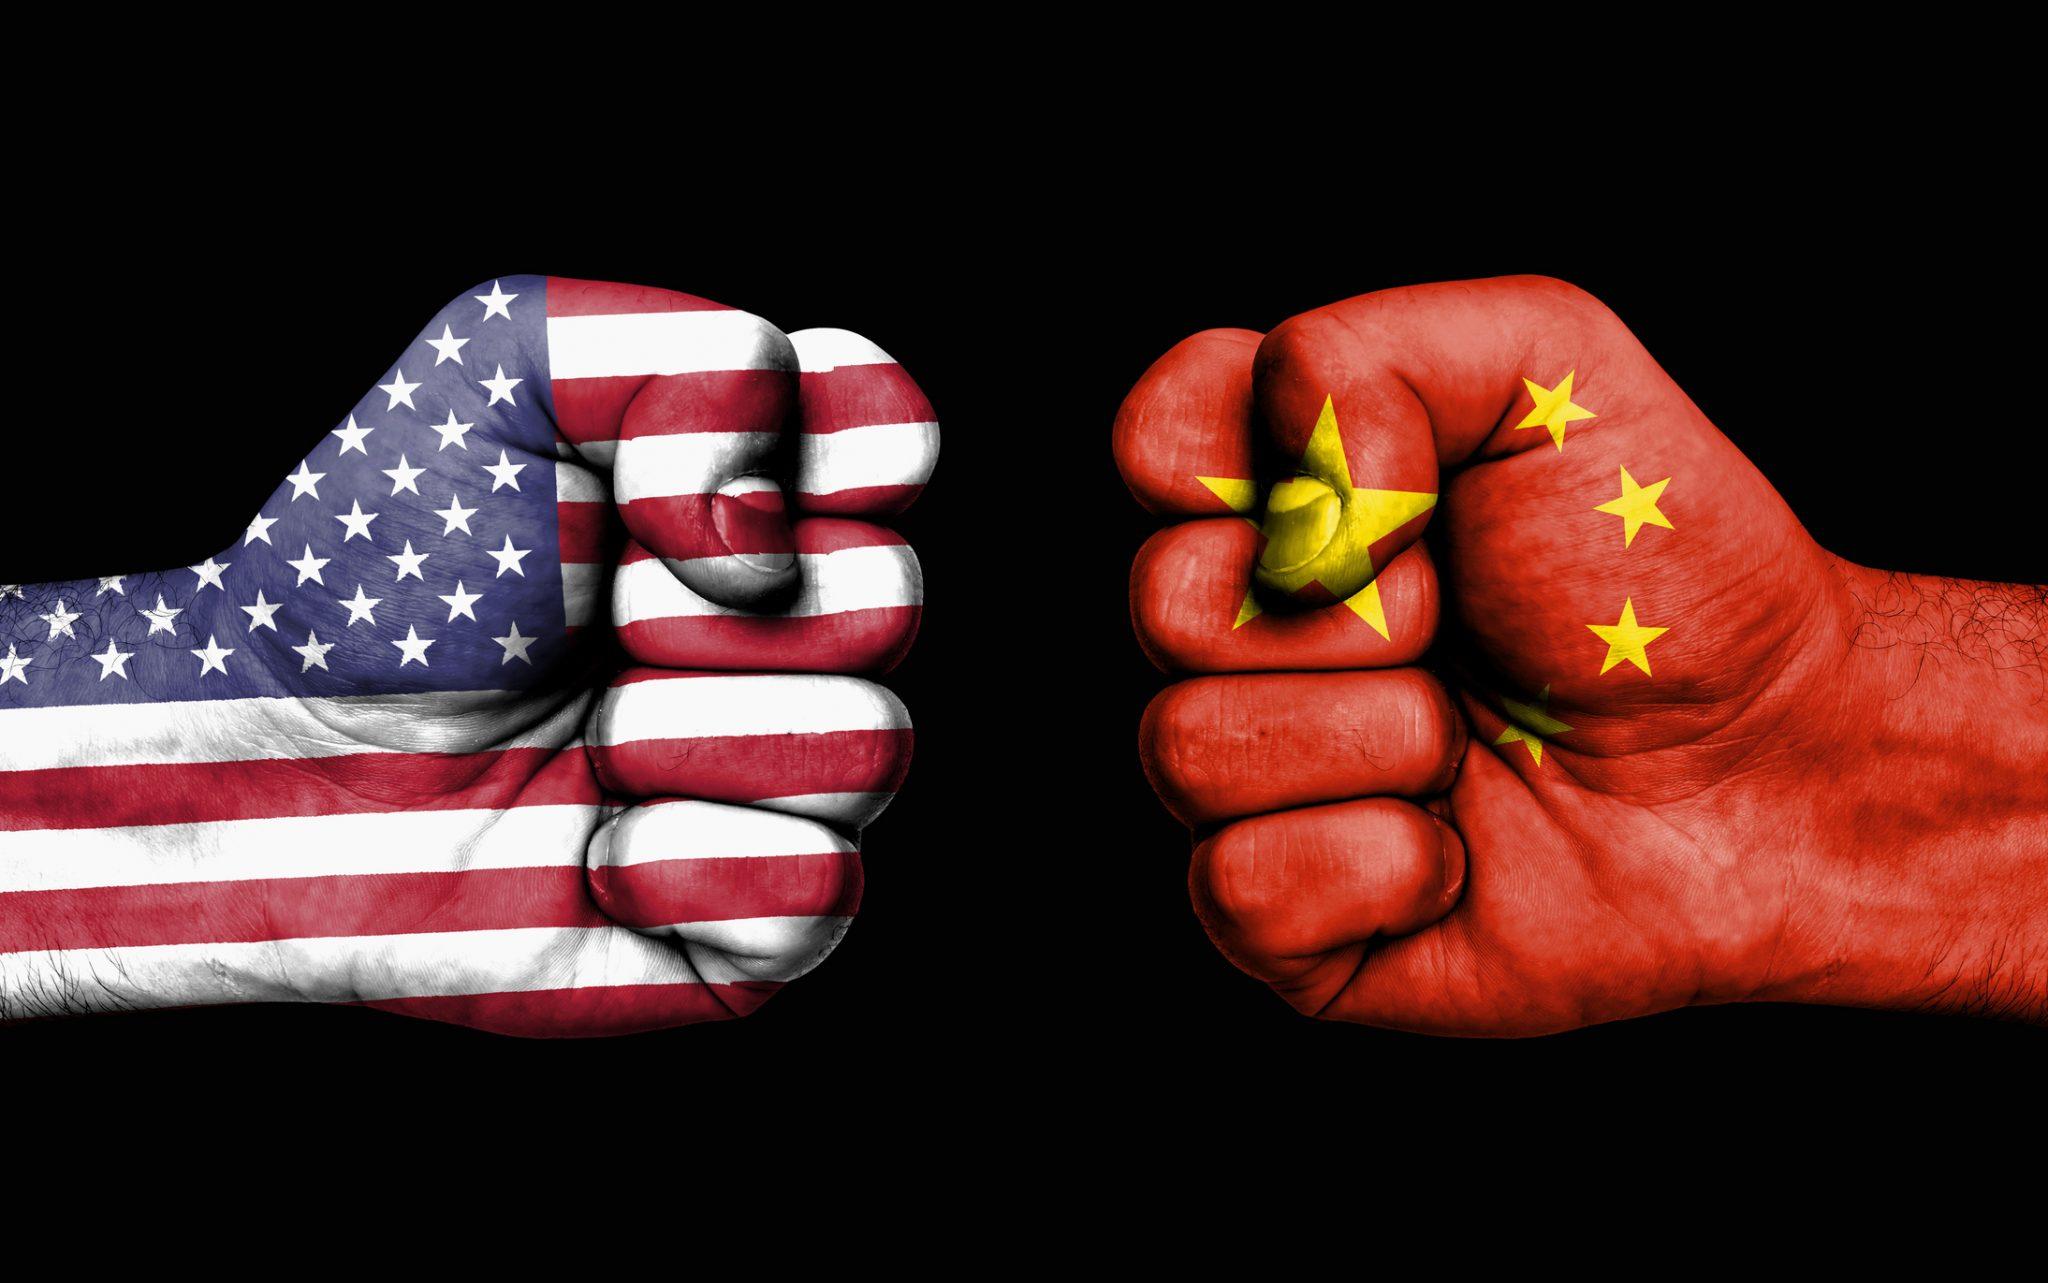 Fair Trade vs Free Trade vs Trade War